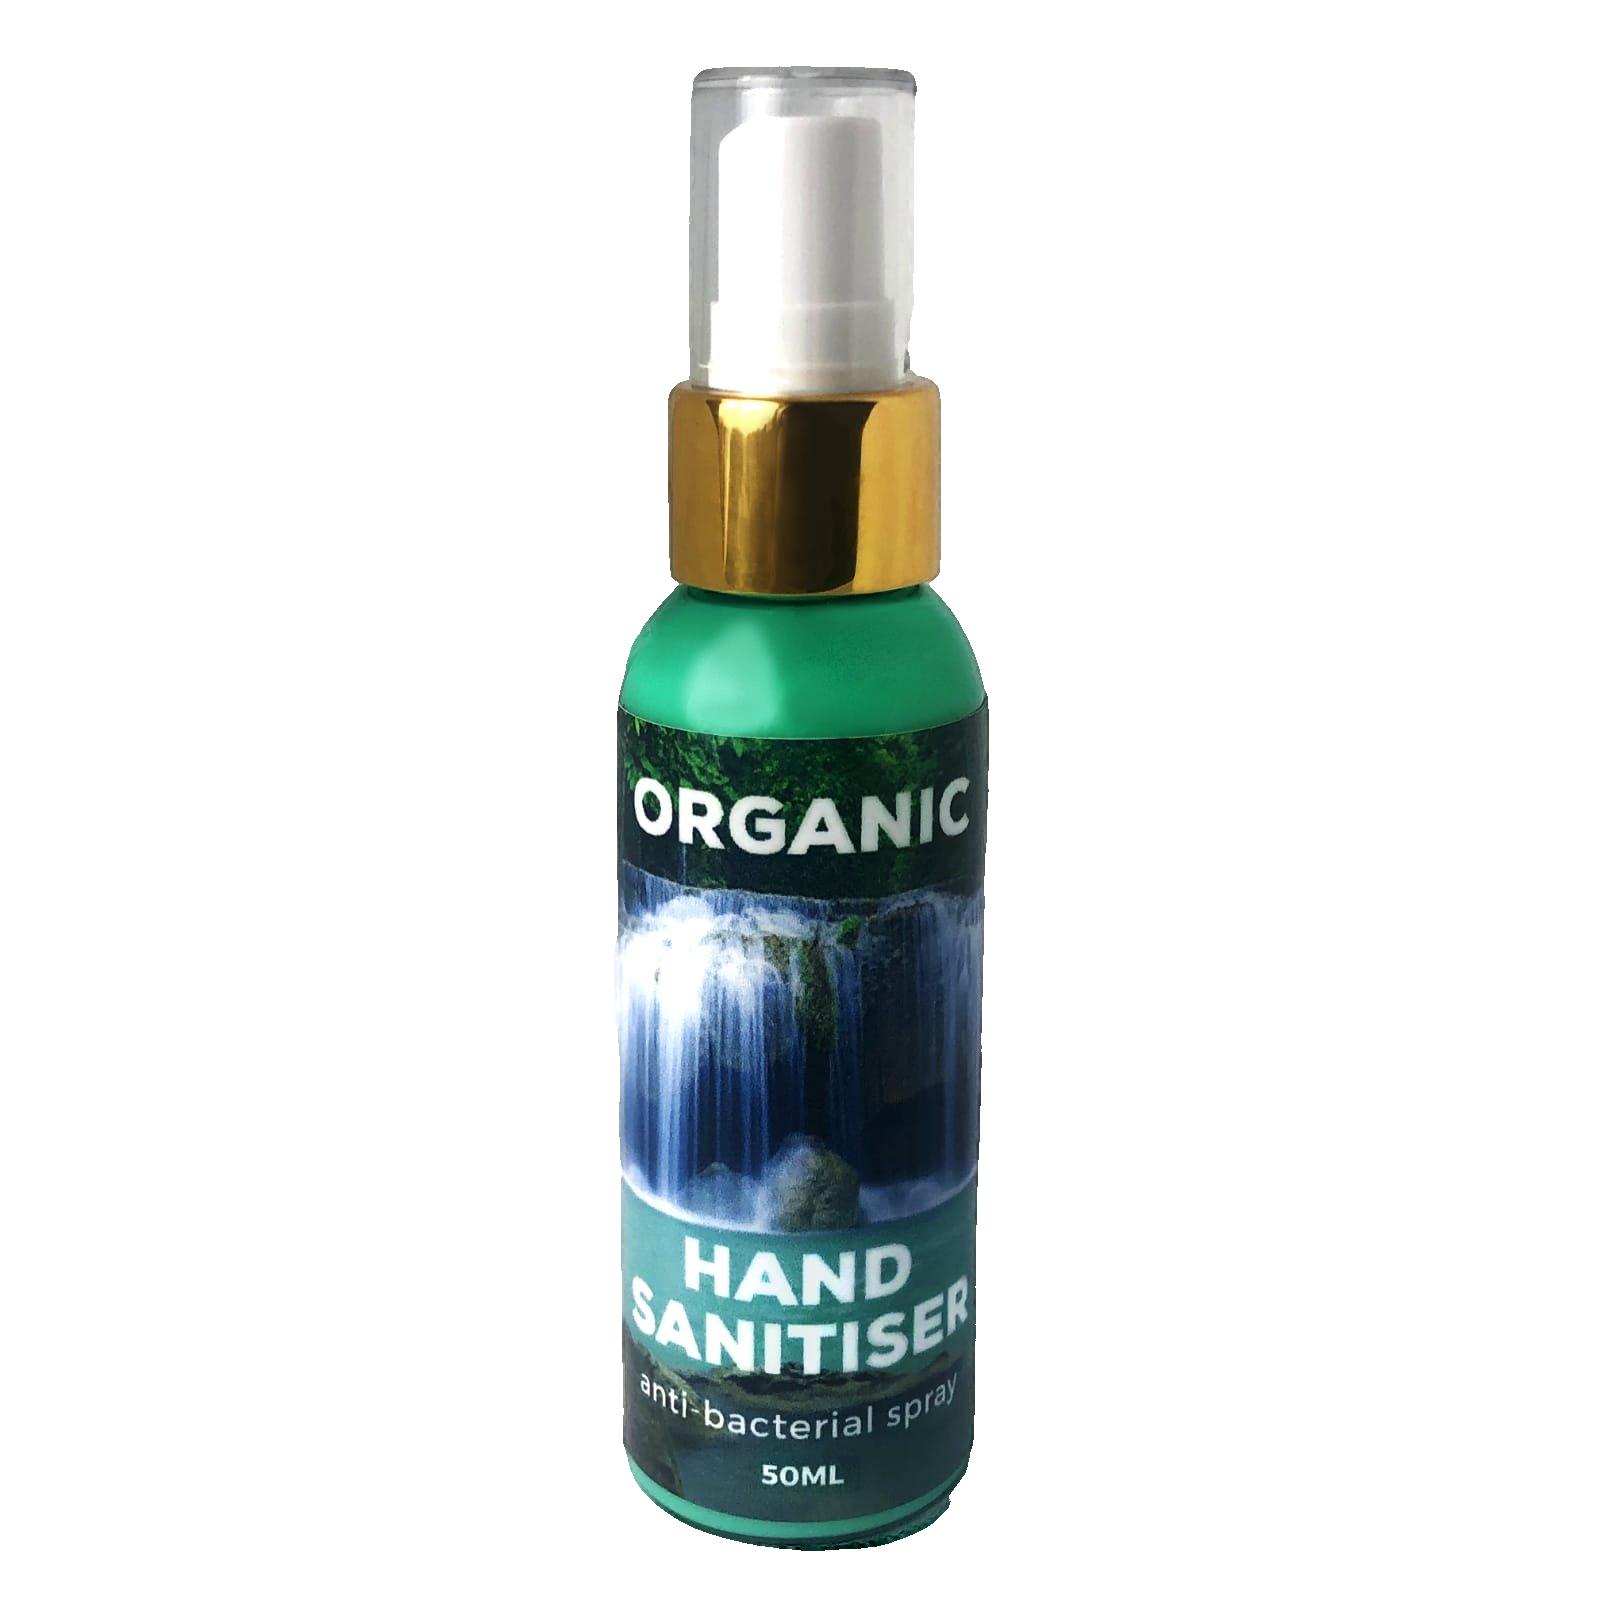 Organic Hand Sanitiser 50ml